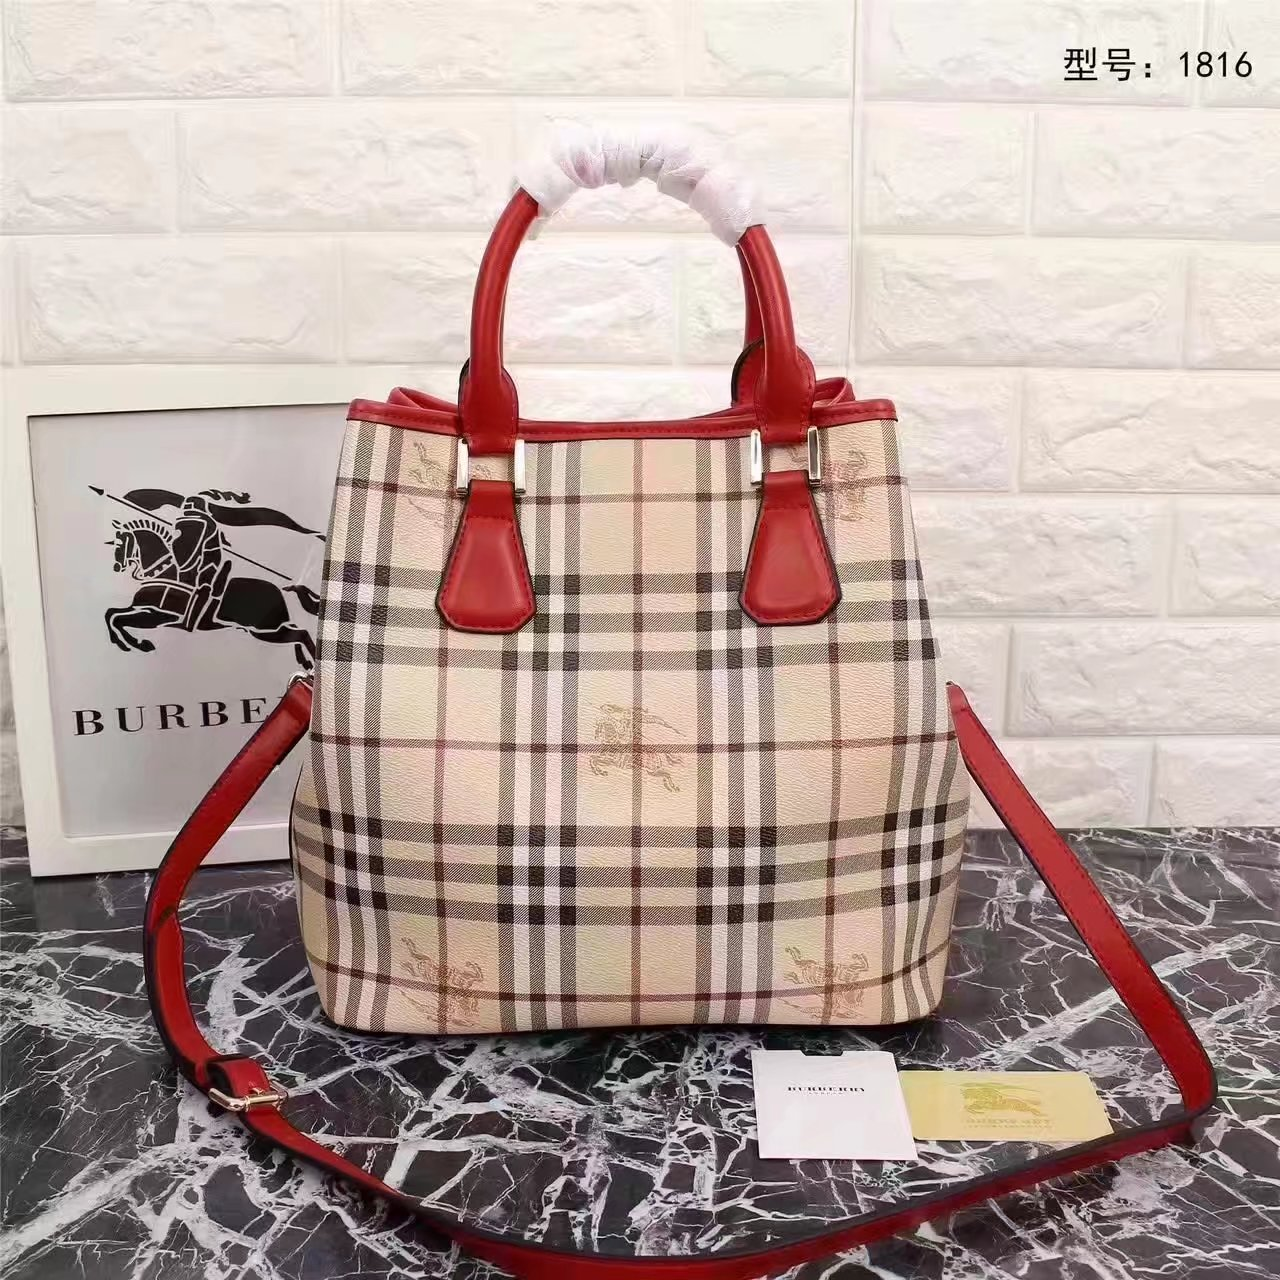 Burberry 1816 Leather and Haymarket Check Shoulder Bag Red